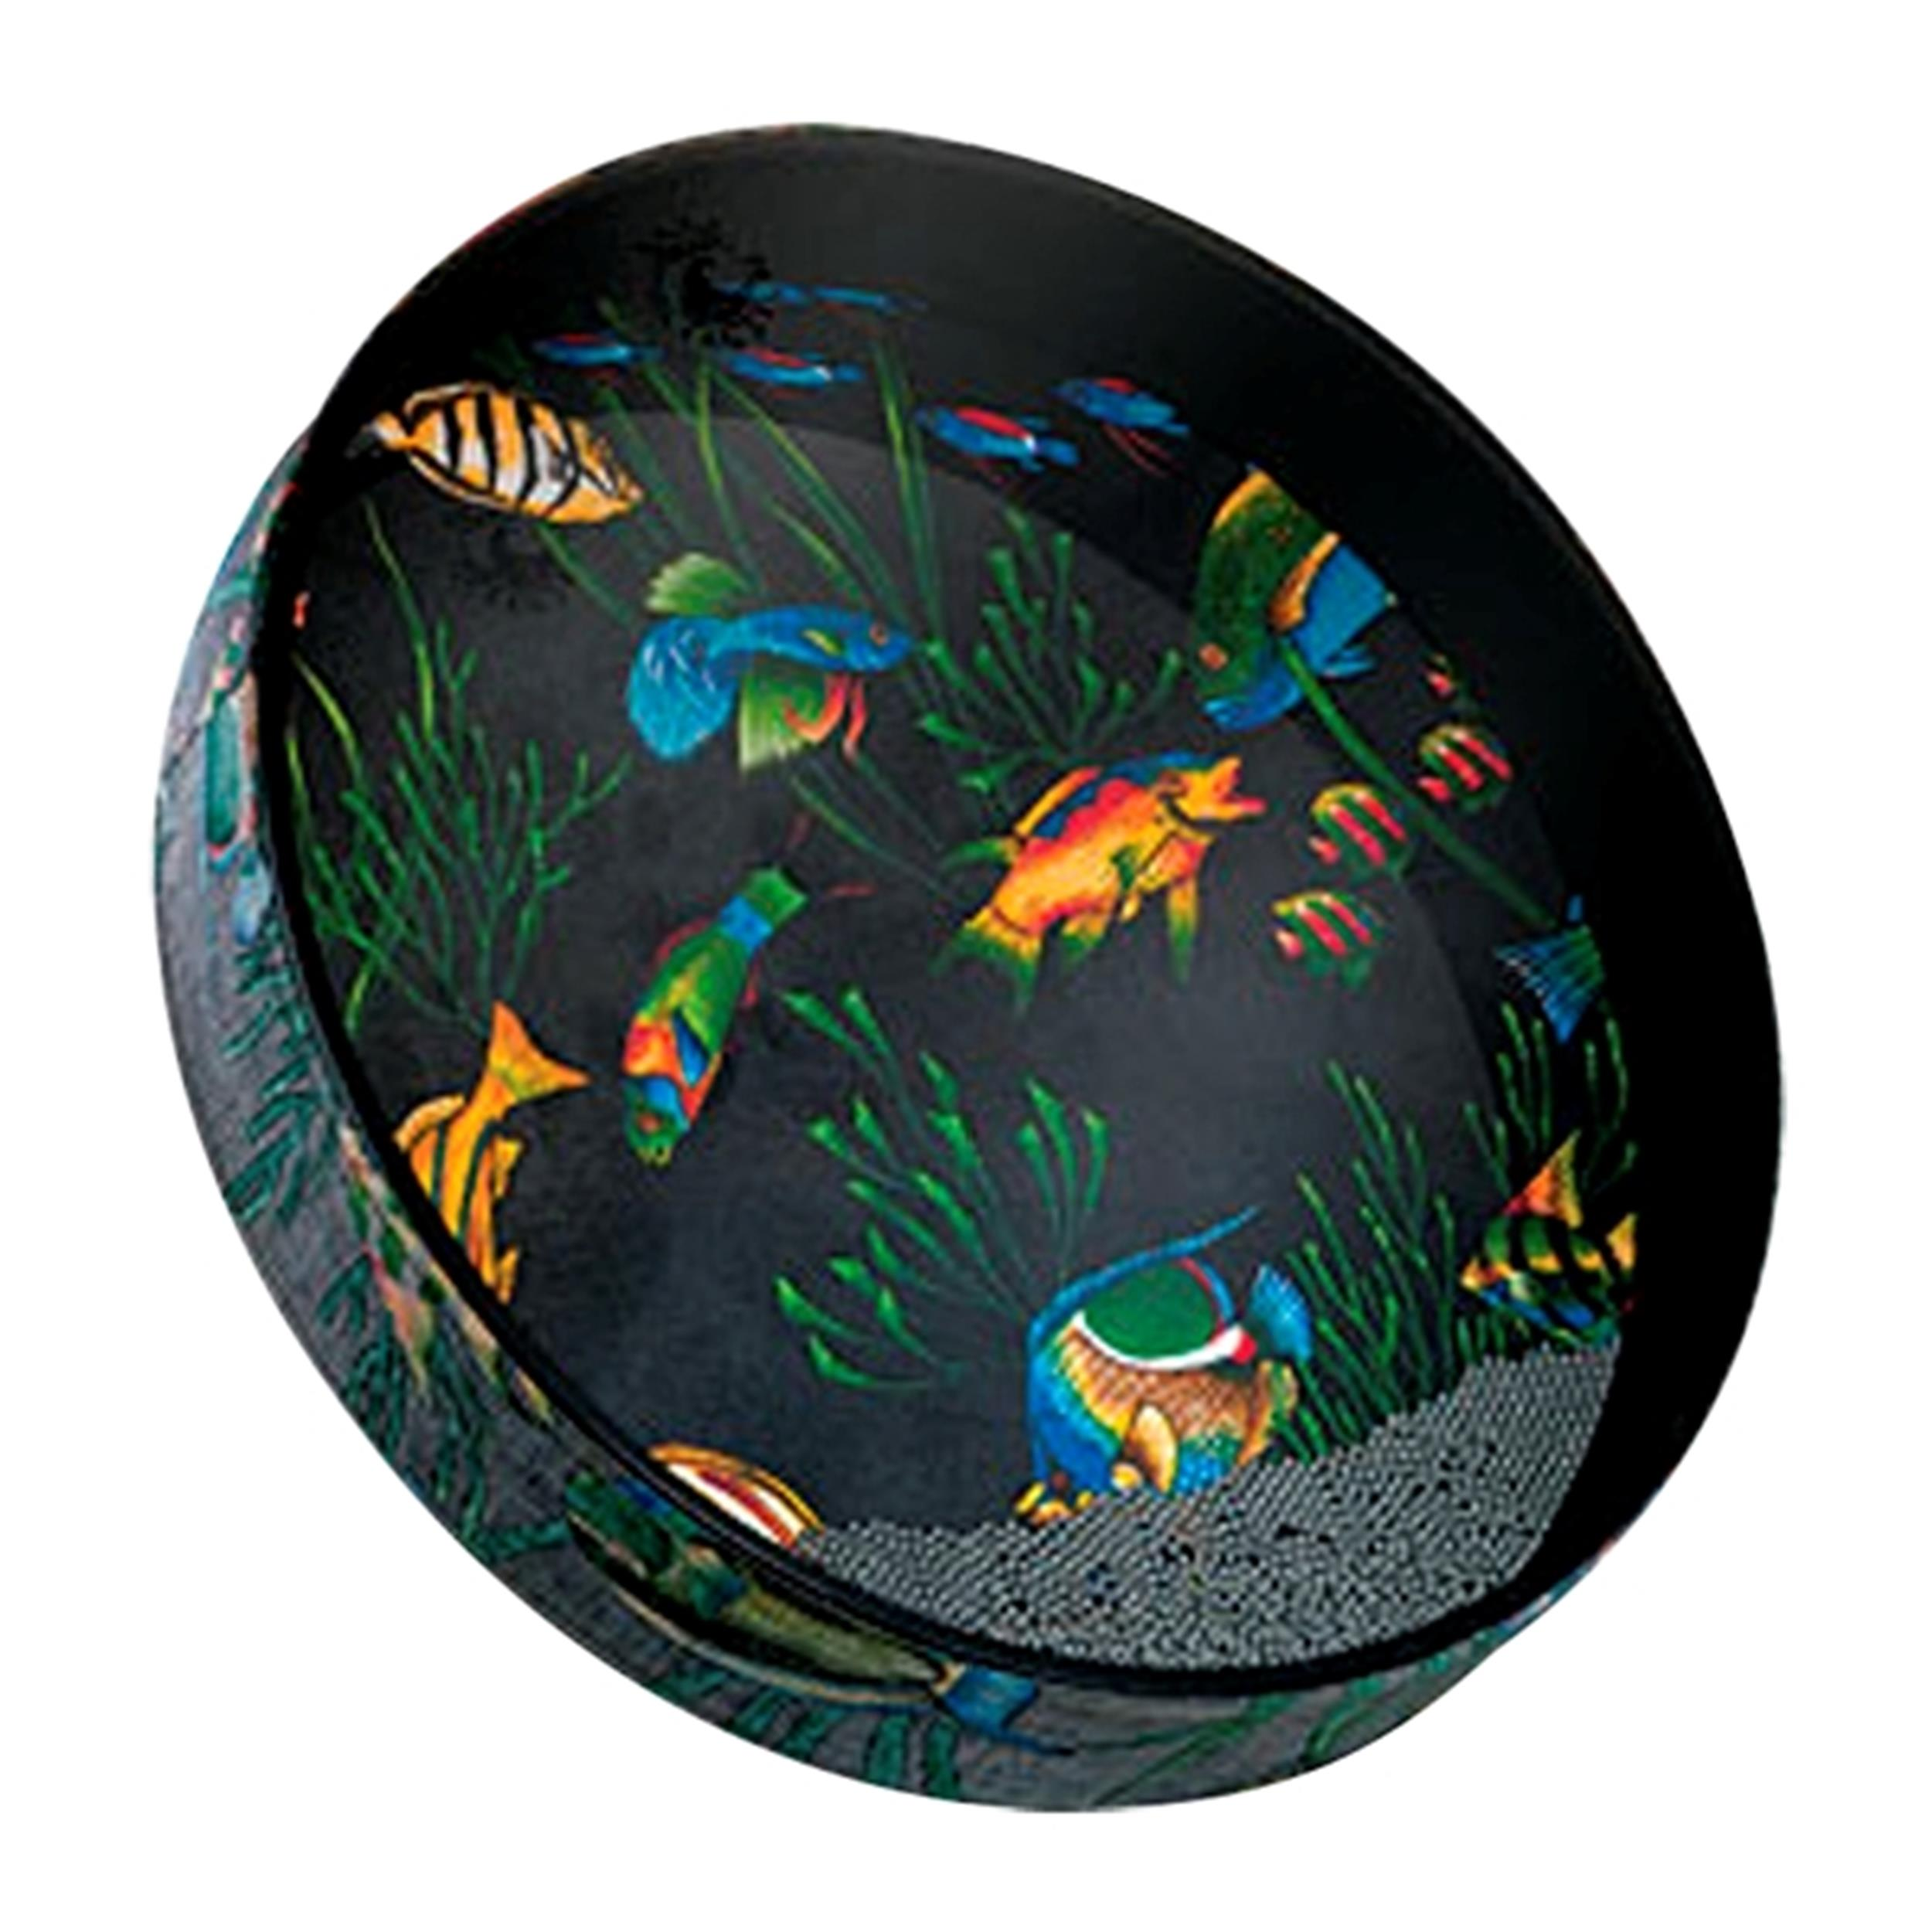 REMO Ocean Drum 2.5x16 - Fish - Batterie / Percussioni Percussioni - Varie